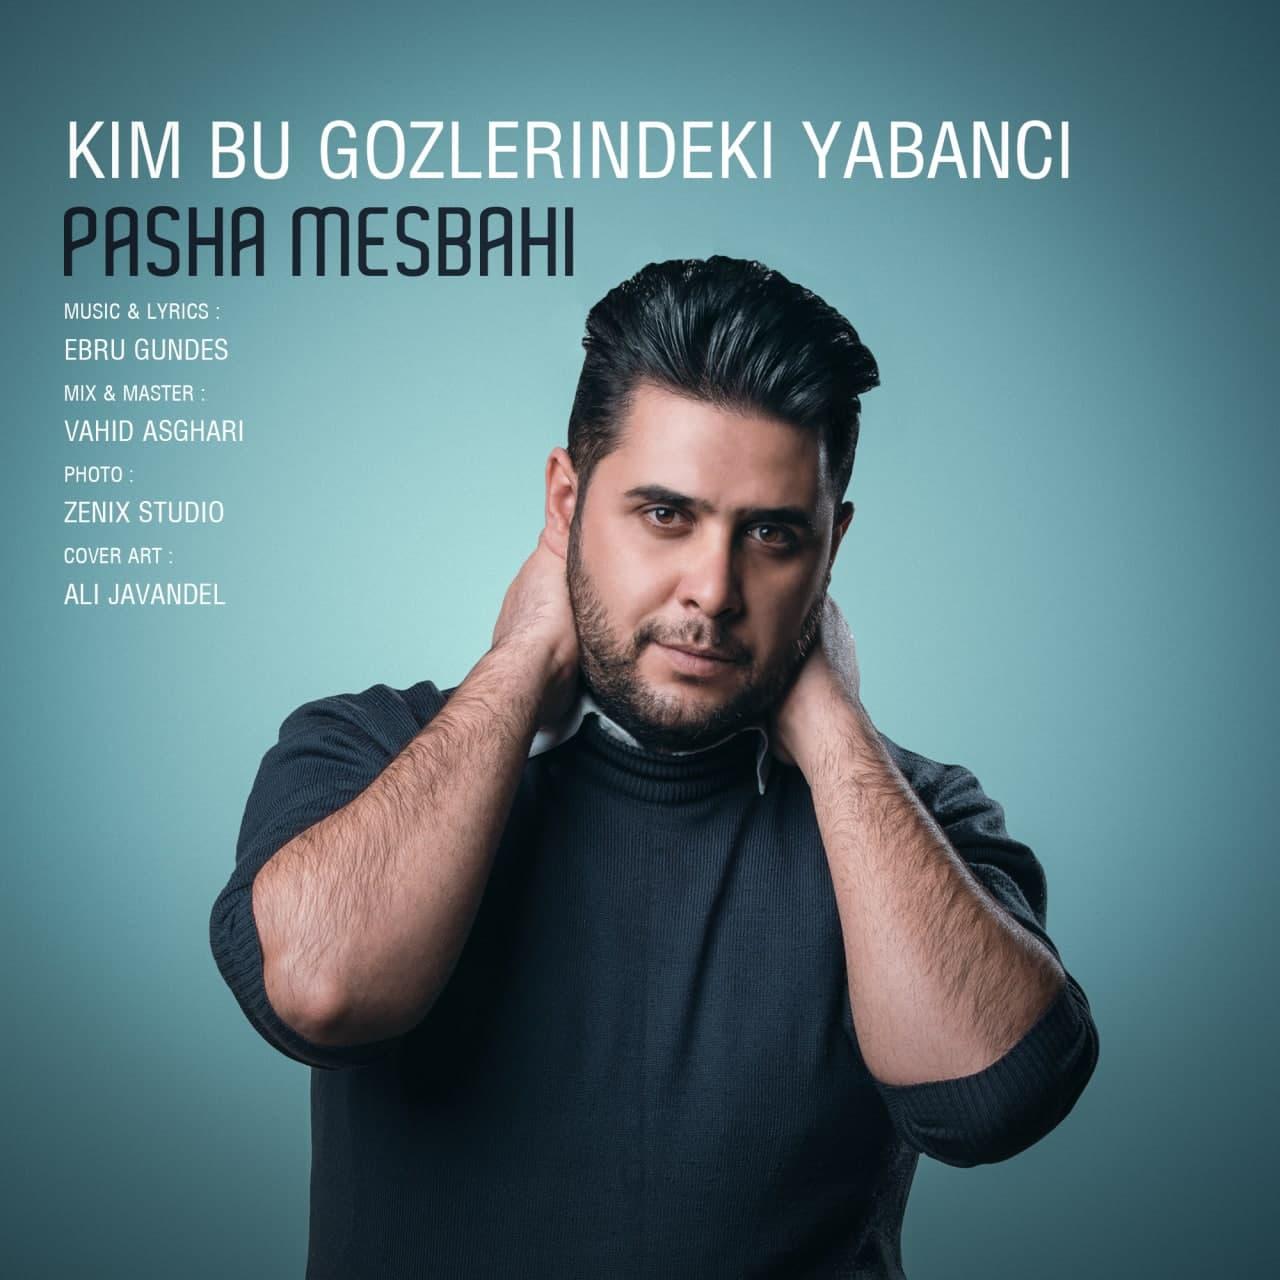 https://s17.picofile.com/file/8426294176/12Pasha_Mesbahi_Kim_Bu_Gozlerindeki_Yabanci.jpg